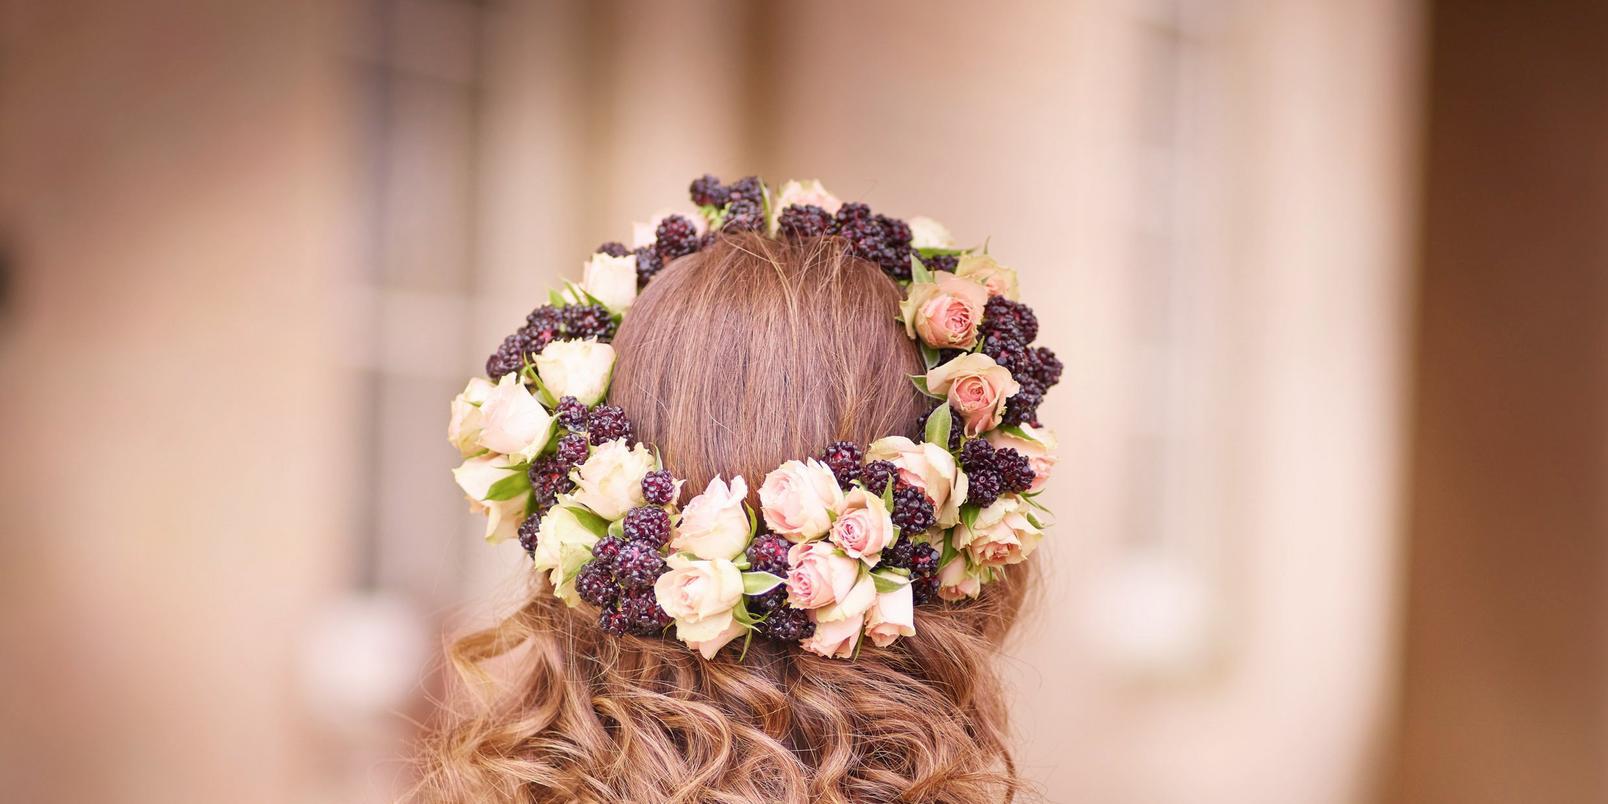 6-wedding-ideas-for-the-autumn-bride-5